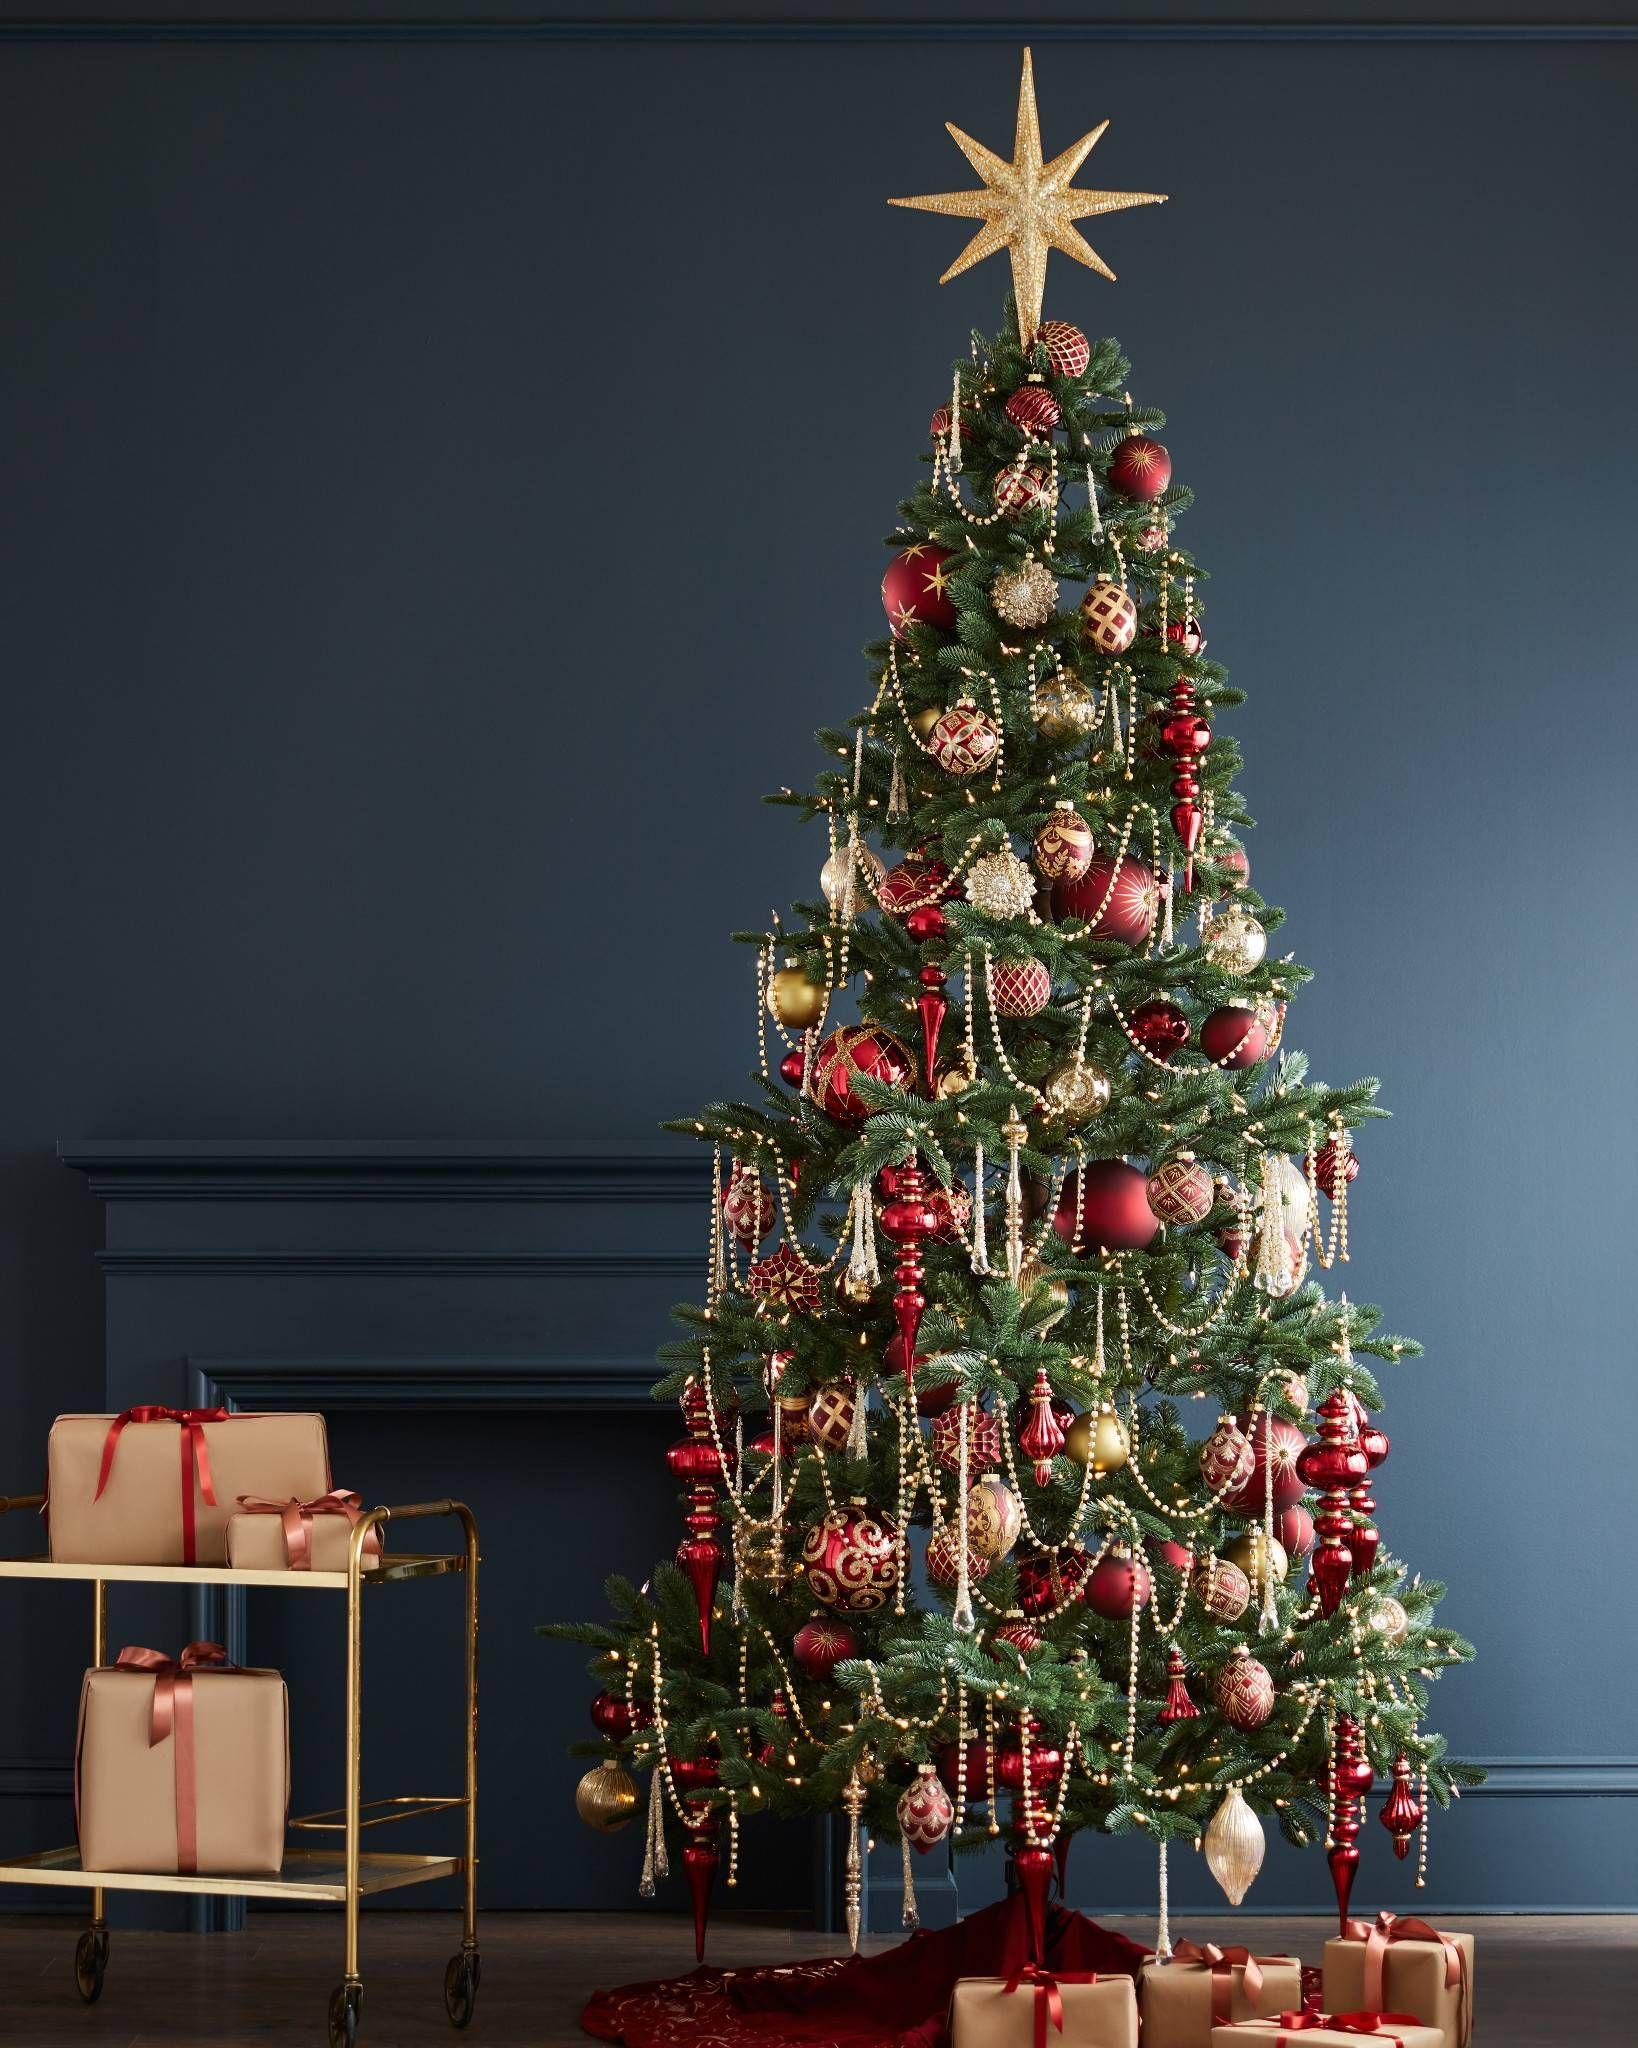 Brilliant Bordeaux Ornament Set Balsam Hill Jeweled Christmas Trees Christmas Tree Garland Victorian Christmas Tree